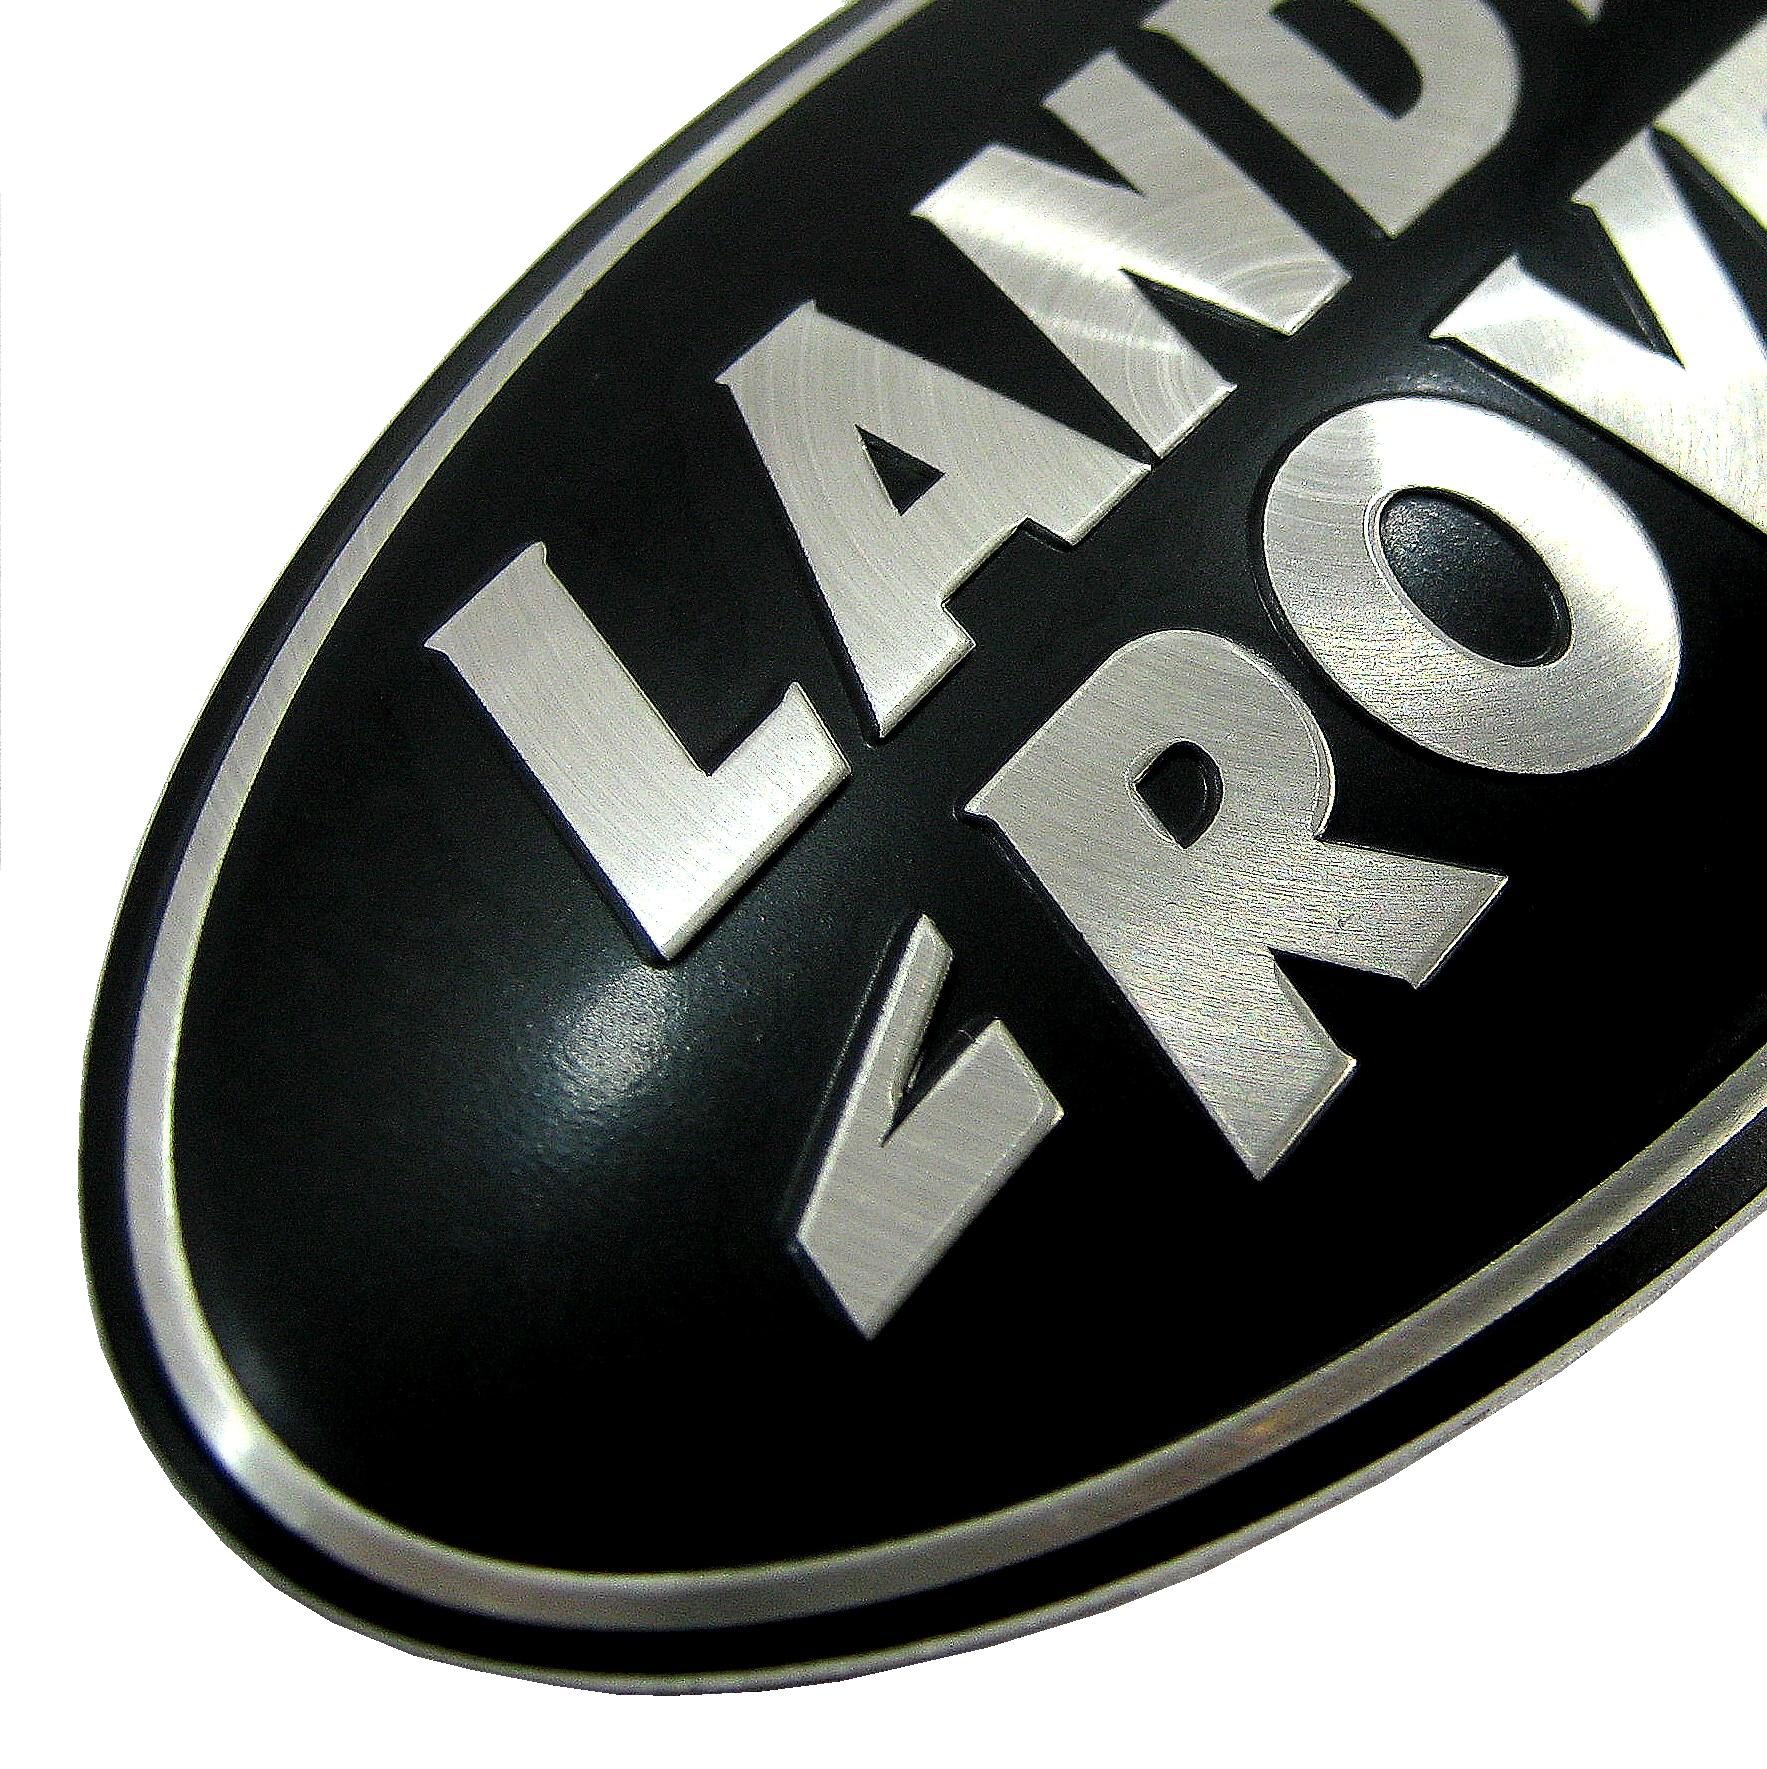 Sell Used 2010 Range Rover Hse Supercharged Black Black: Land Rover Freelander 1 BLACK+SILVER Rear Door Badge Oval